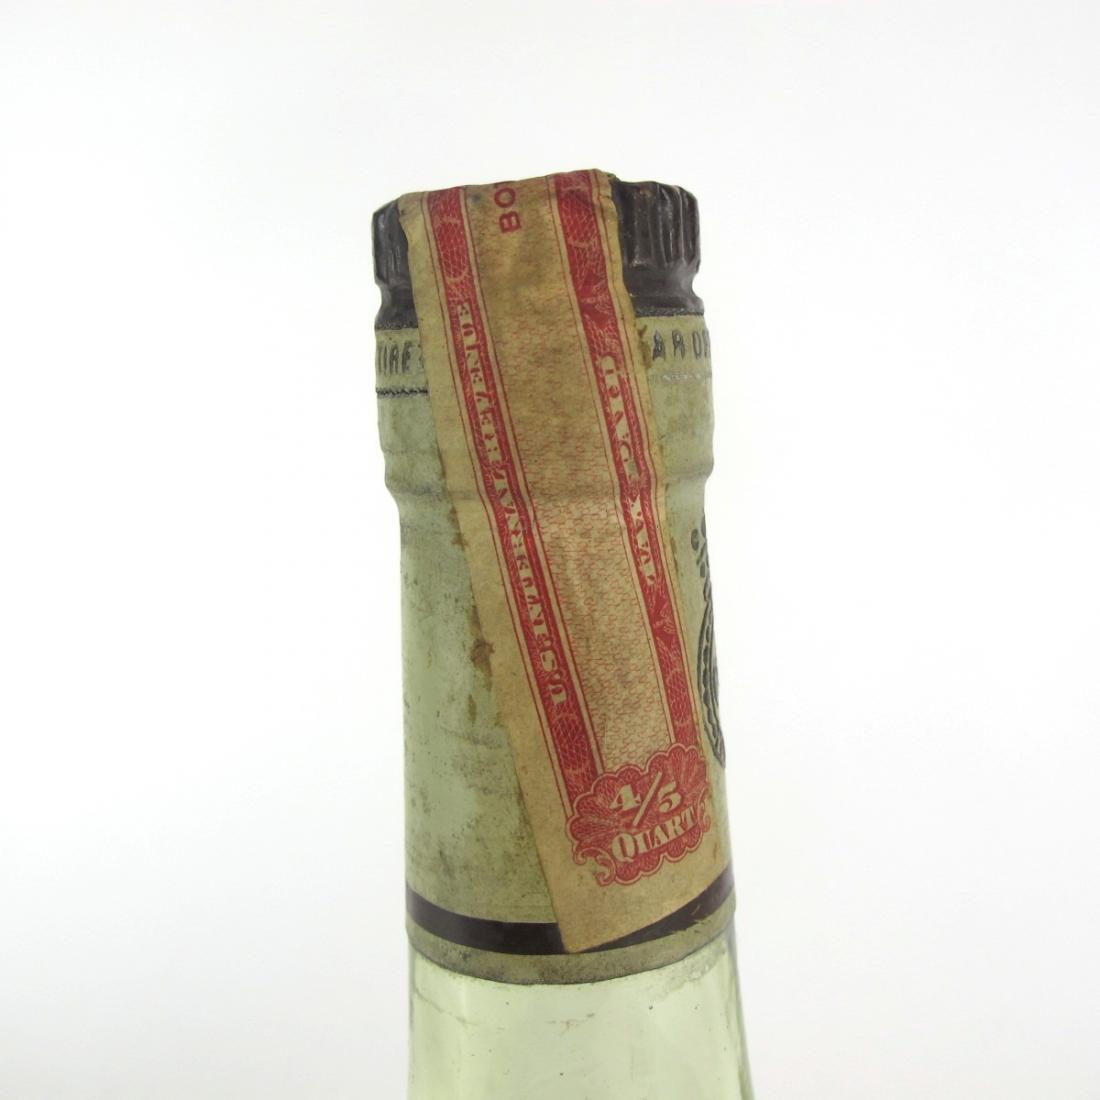 Otard VSOP 20 Year Old Cognac 1960s / US Import